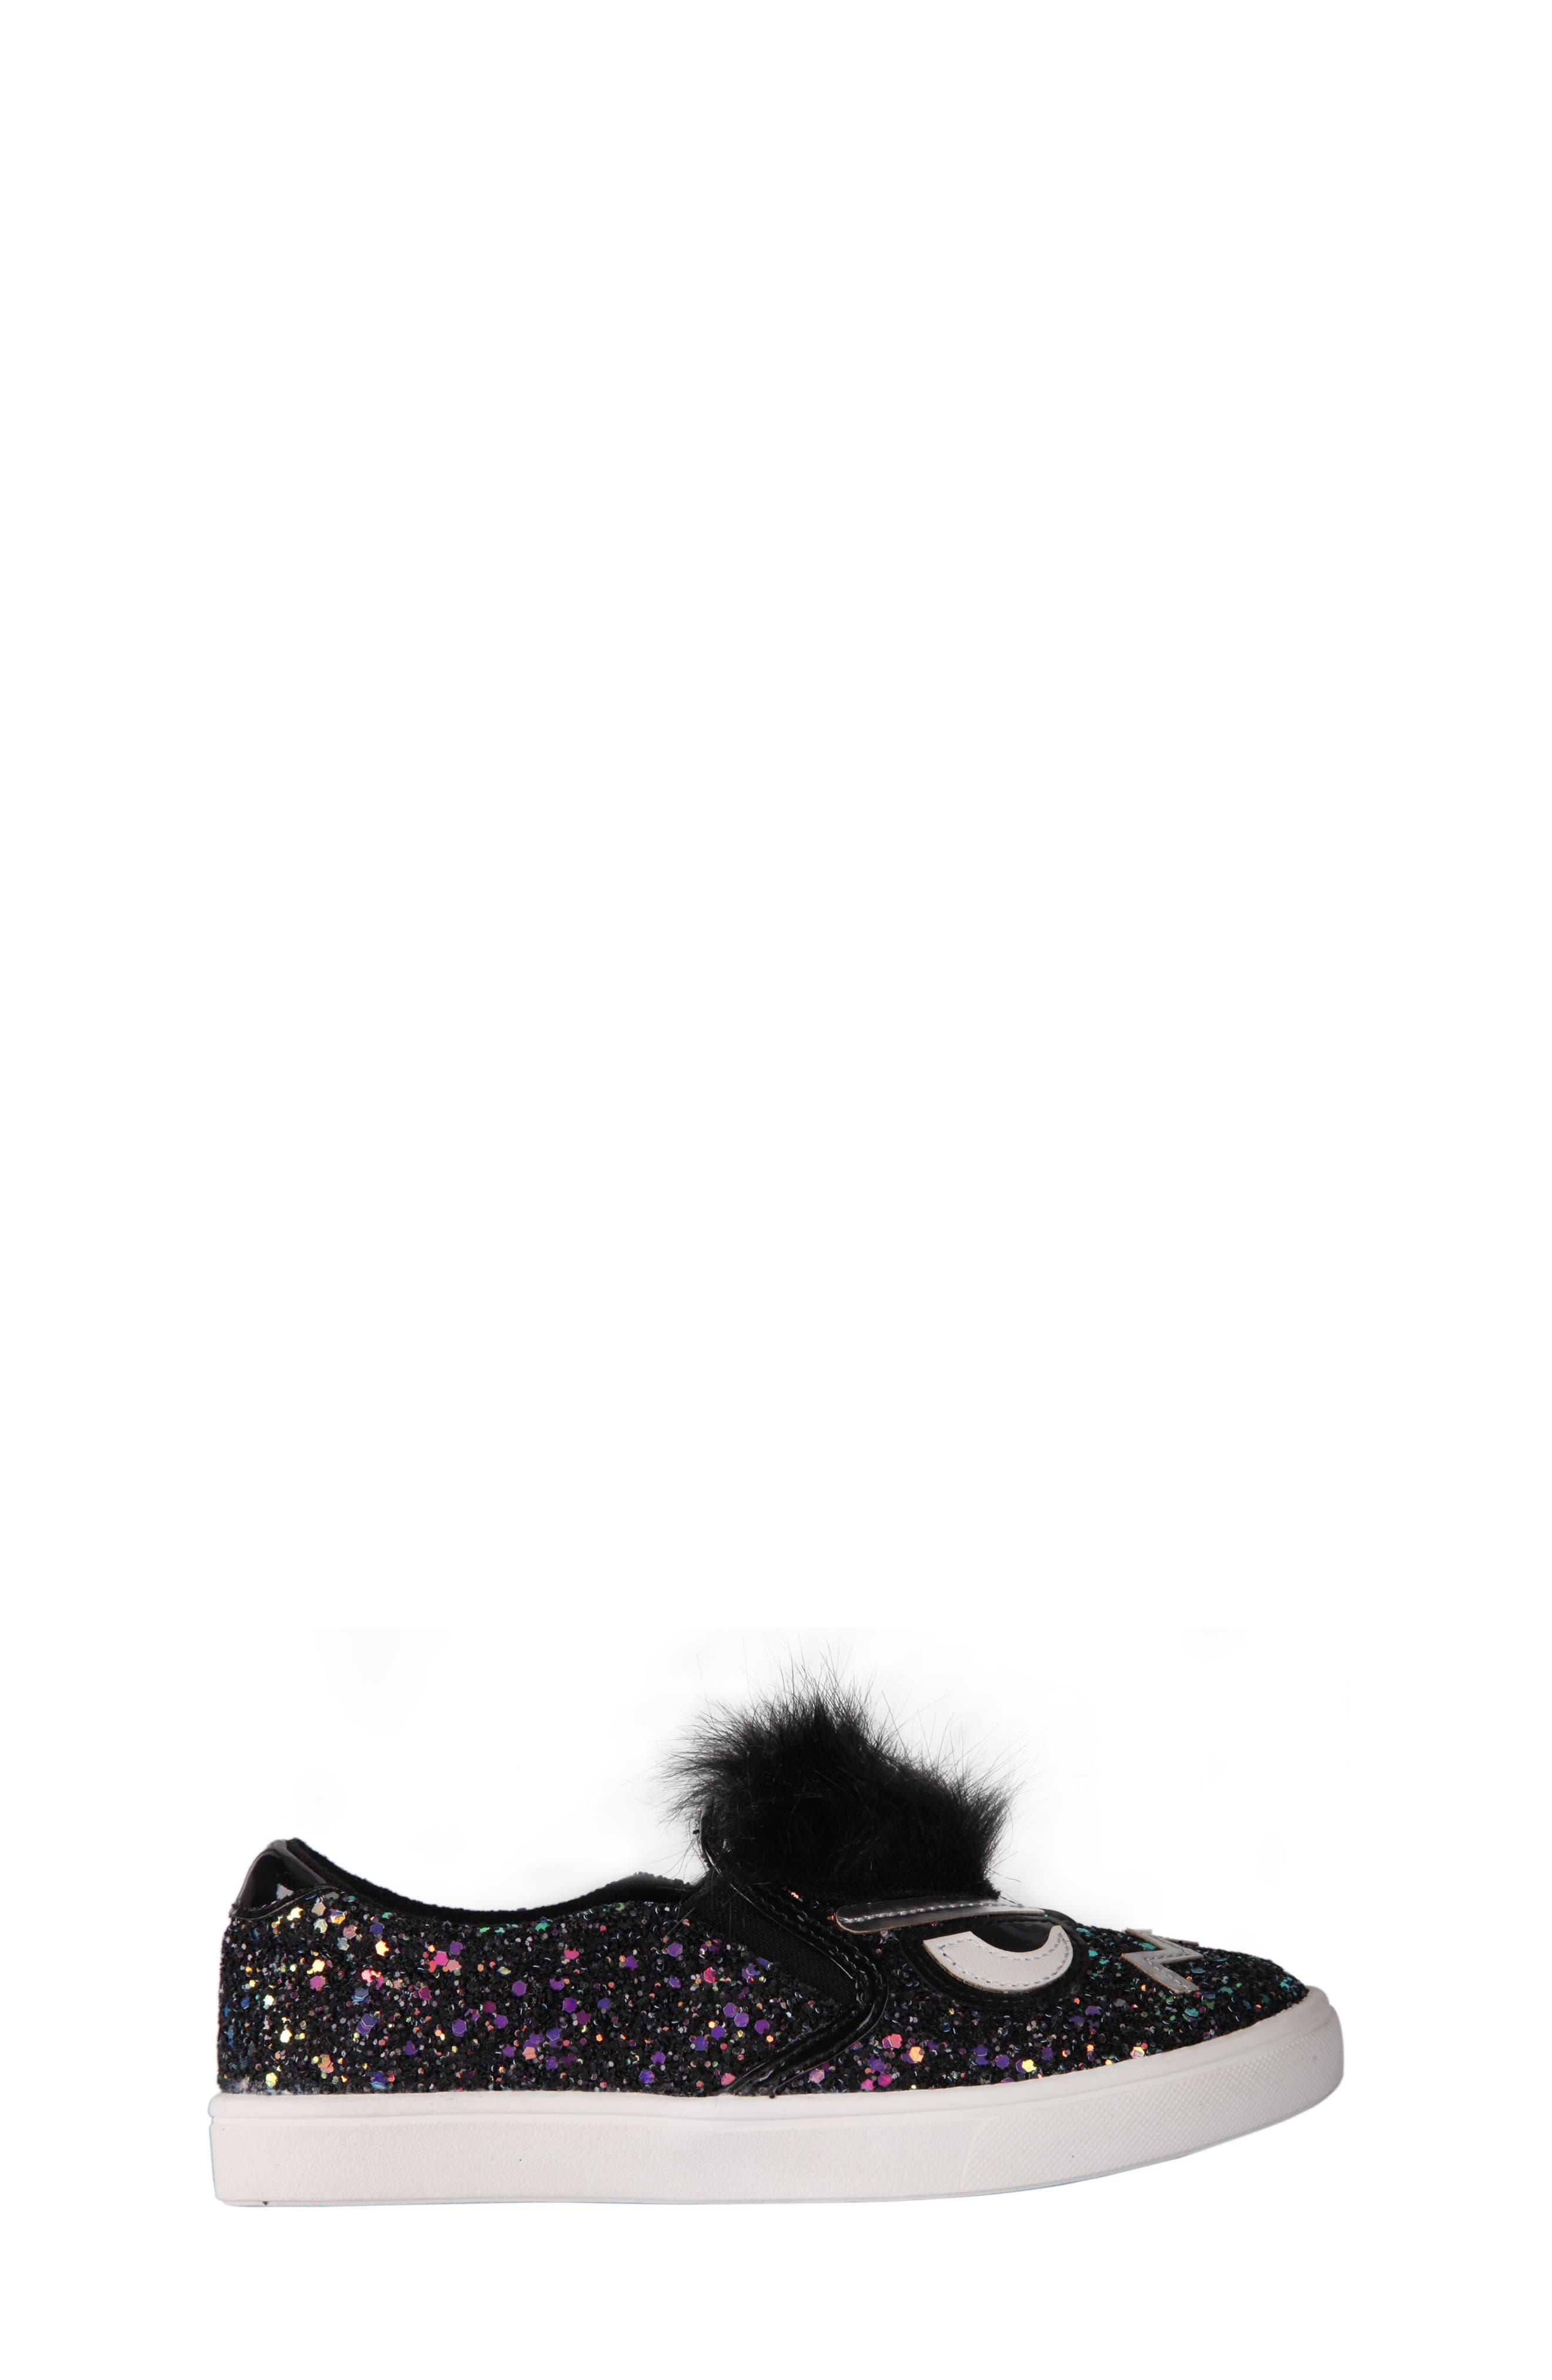 Alternate Image 3  - Nina Alyx Faux Fur Glittery Slip-On Sneaker (Walker & Toddler)